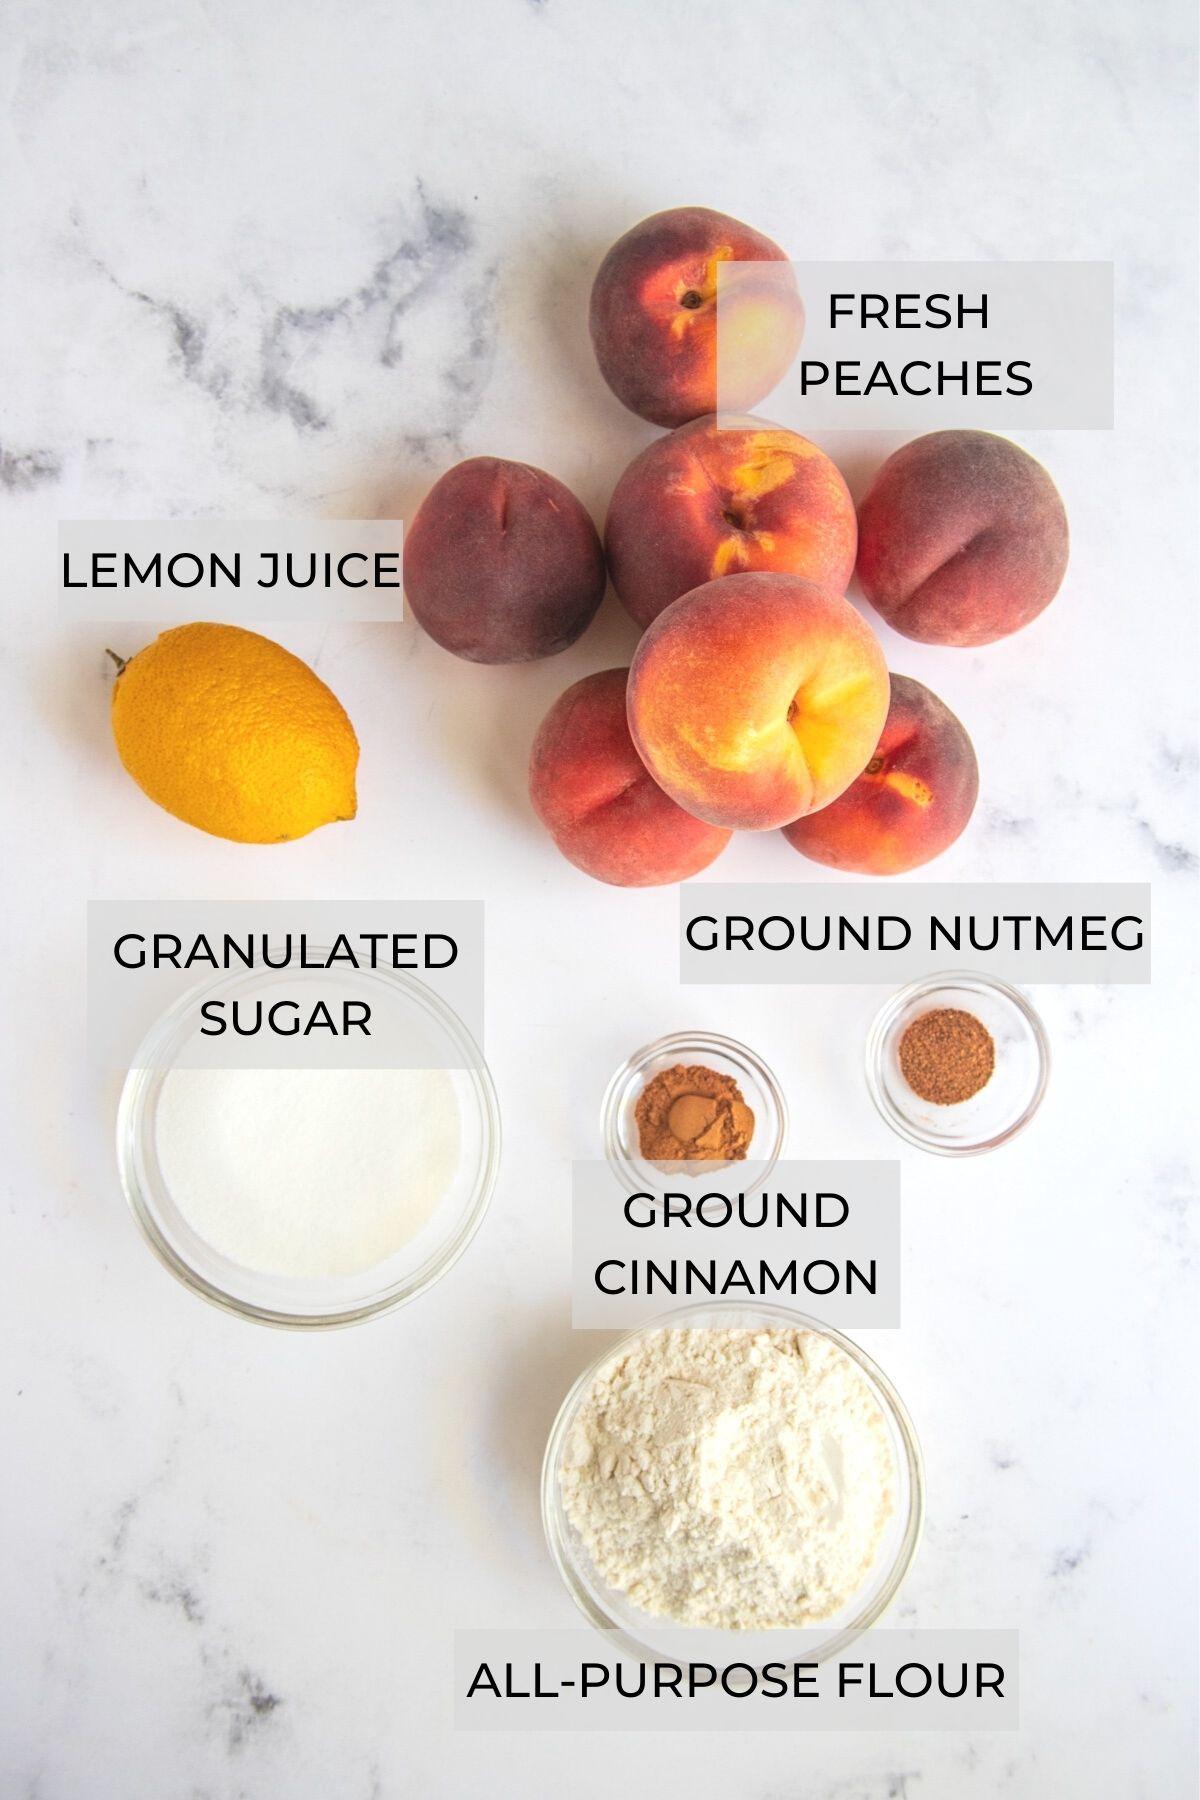 Peach Crumble Pie Peach Filling Ingredients - Peaches, ground nutmeg, ground cinnamon, flour, sugar and lemon juice